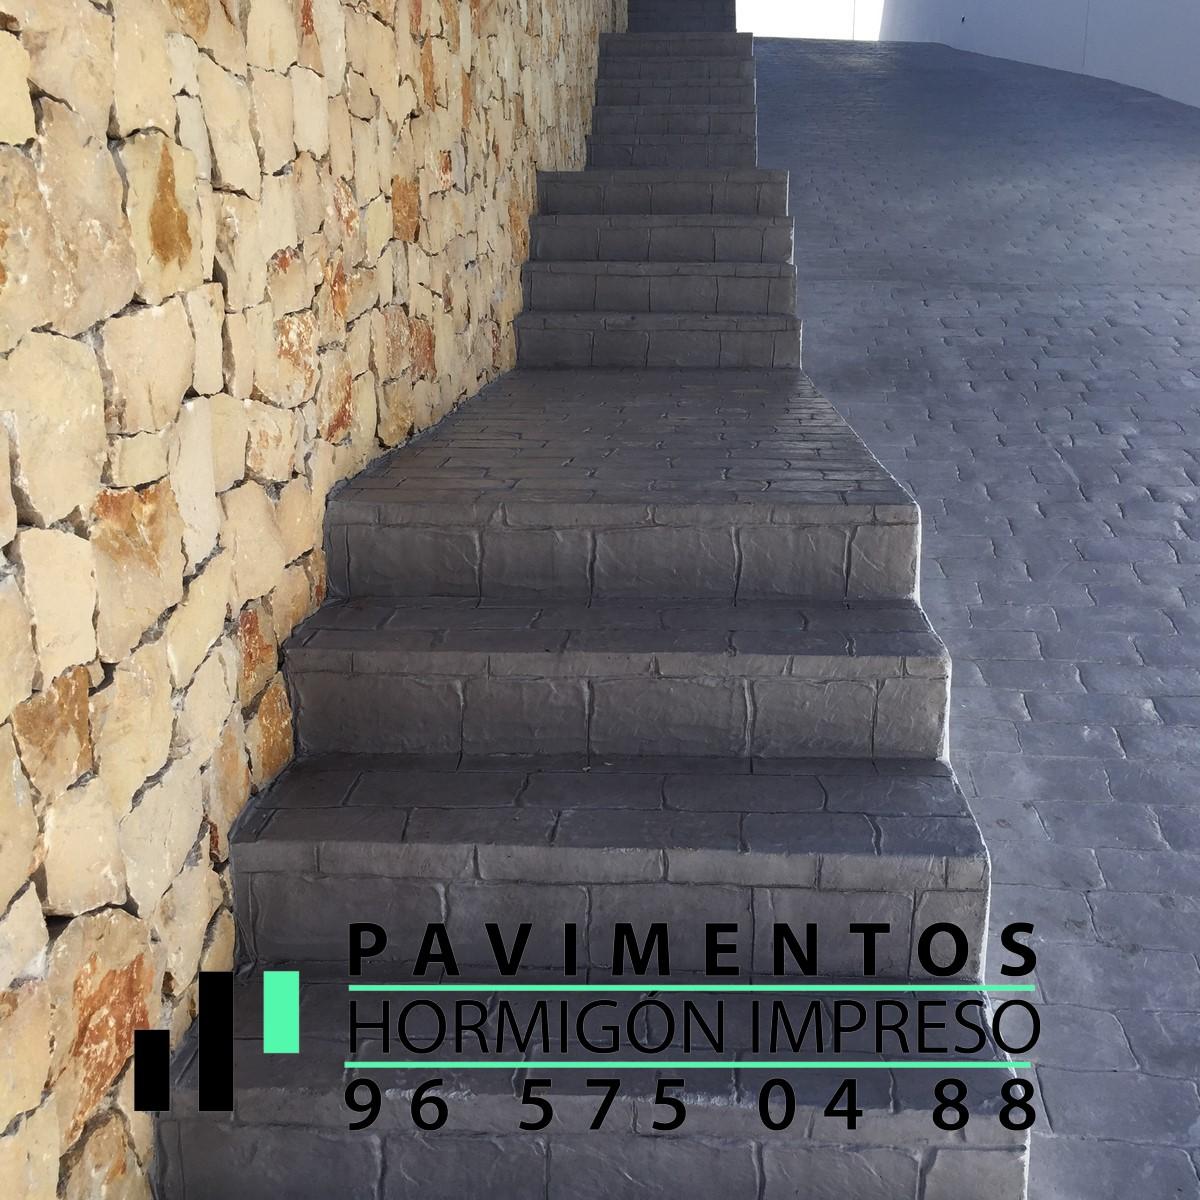 PavimentosHormigonImpreso (10)